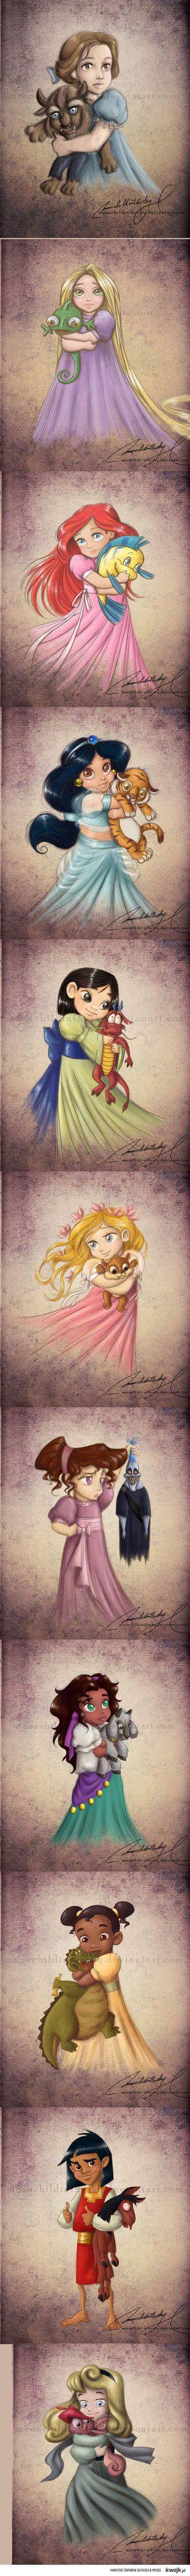 Disney Royalty   Belle, Rapunzel,Ariel, Jasmine, Mulan, Sleeping Beauty,Megra, Esméralda  , Tiana, Emperor Kuzco, Cinderella :)